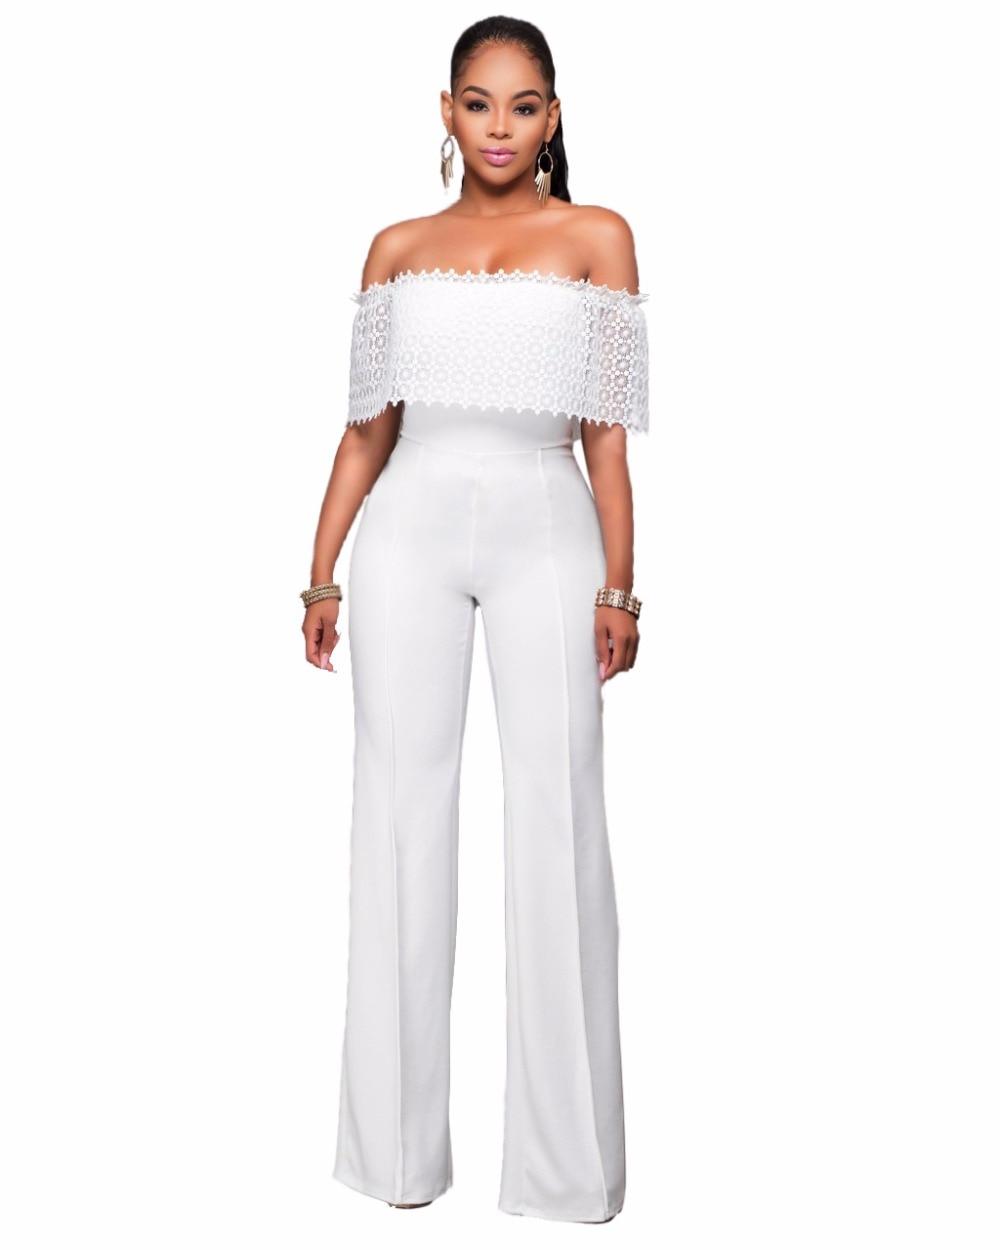 White Elegant Jumpsuit - Breeze Clothing